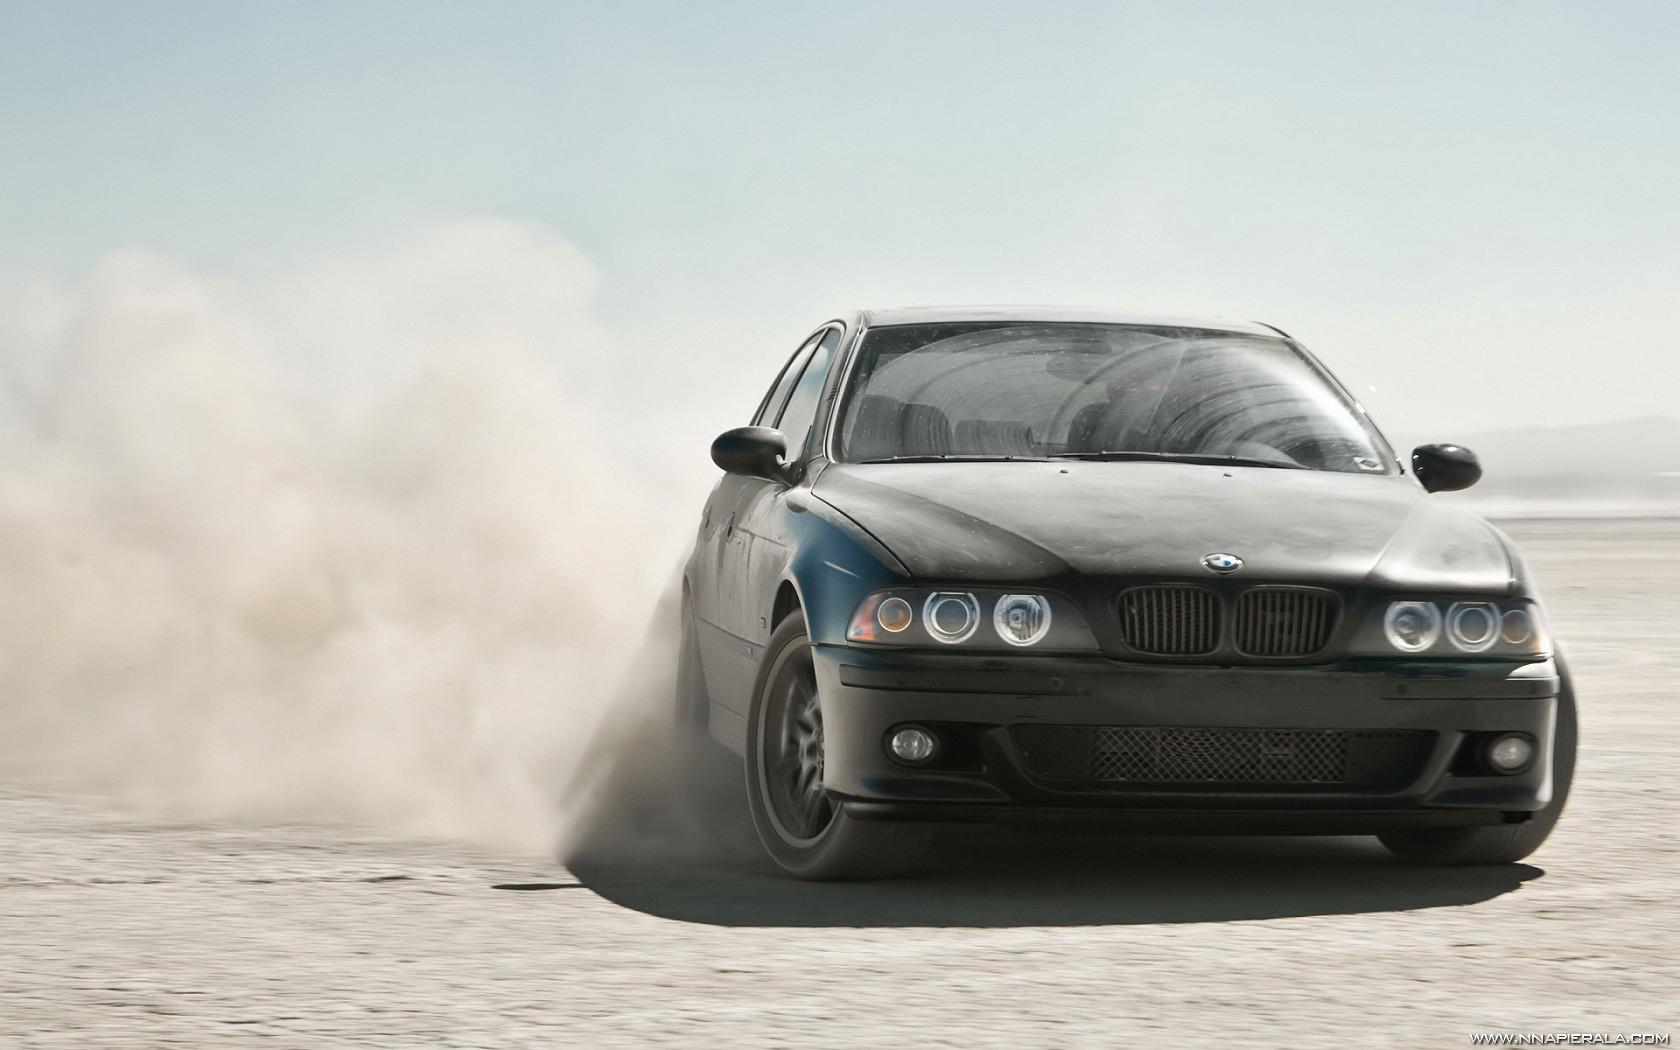 Cars Bmw Black Smoke Drift Strong Image By Amr Sabry